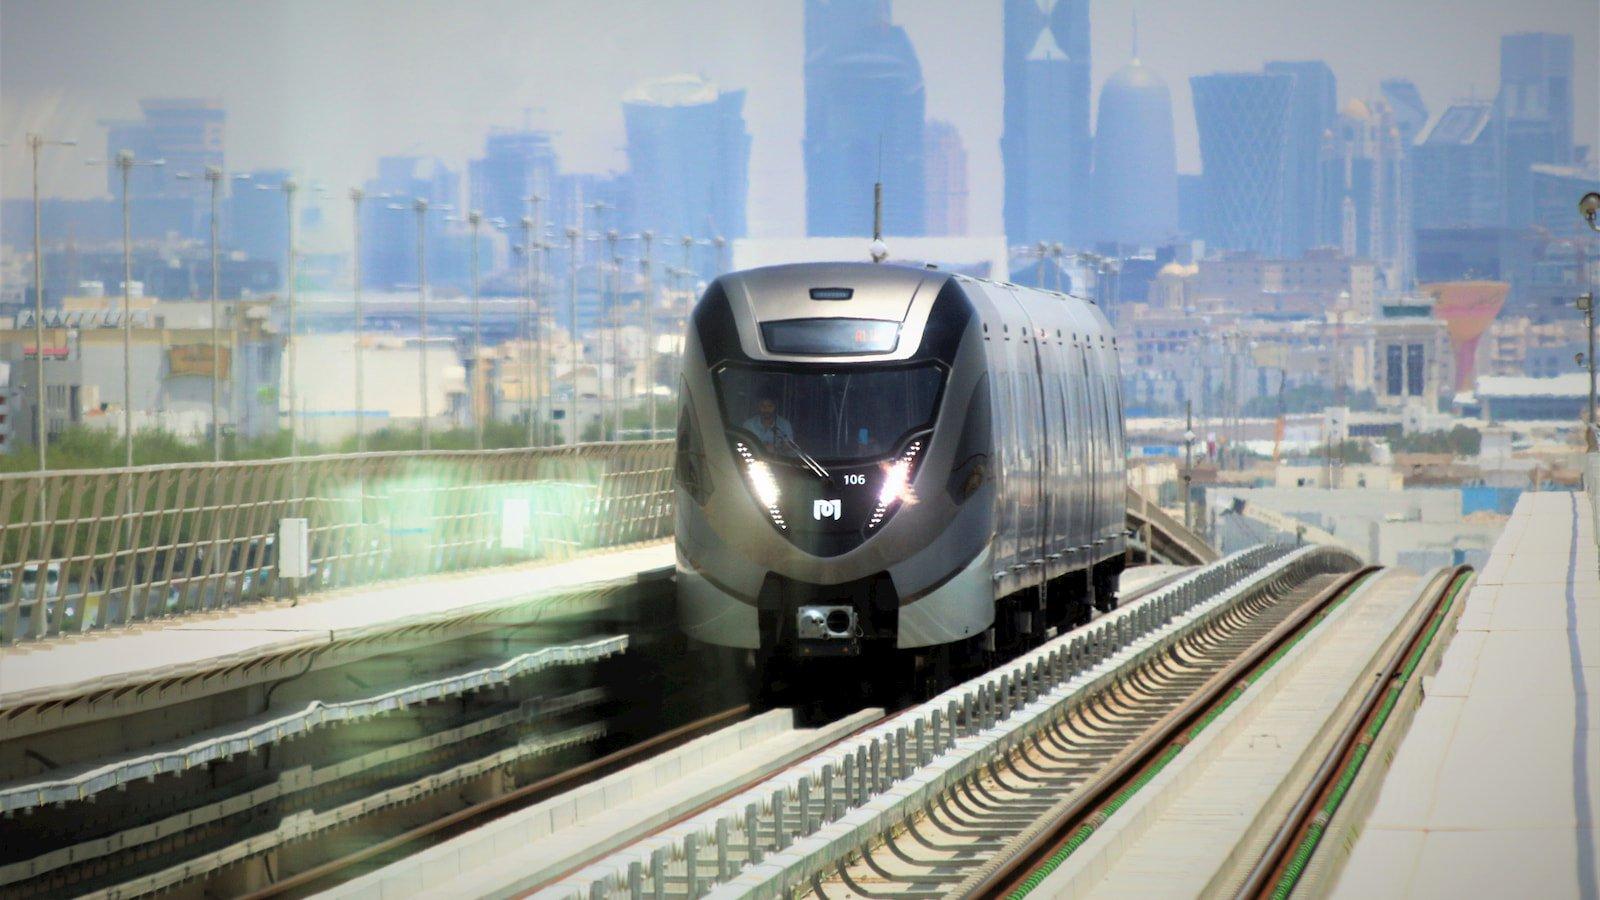 Qatar Metro - West Bay on the Background.jpg